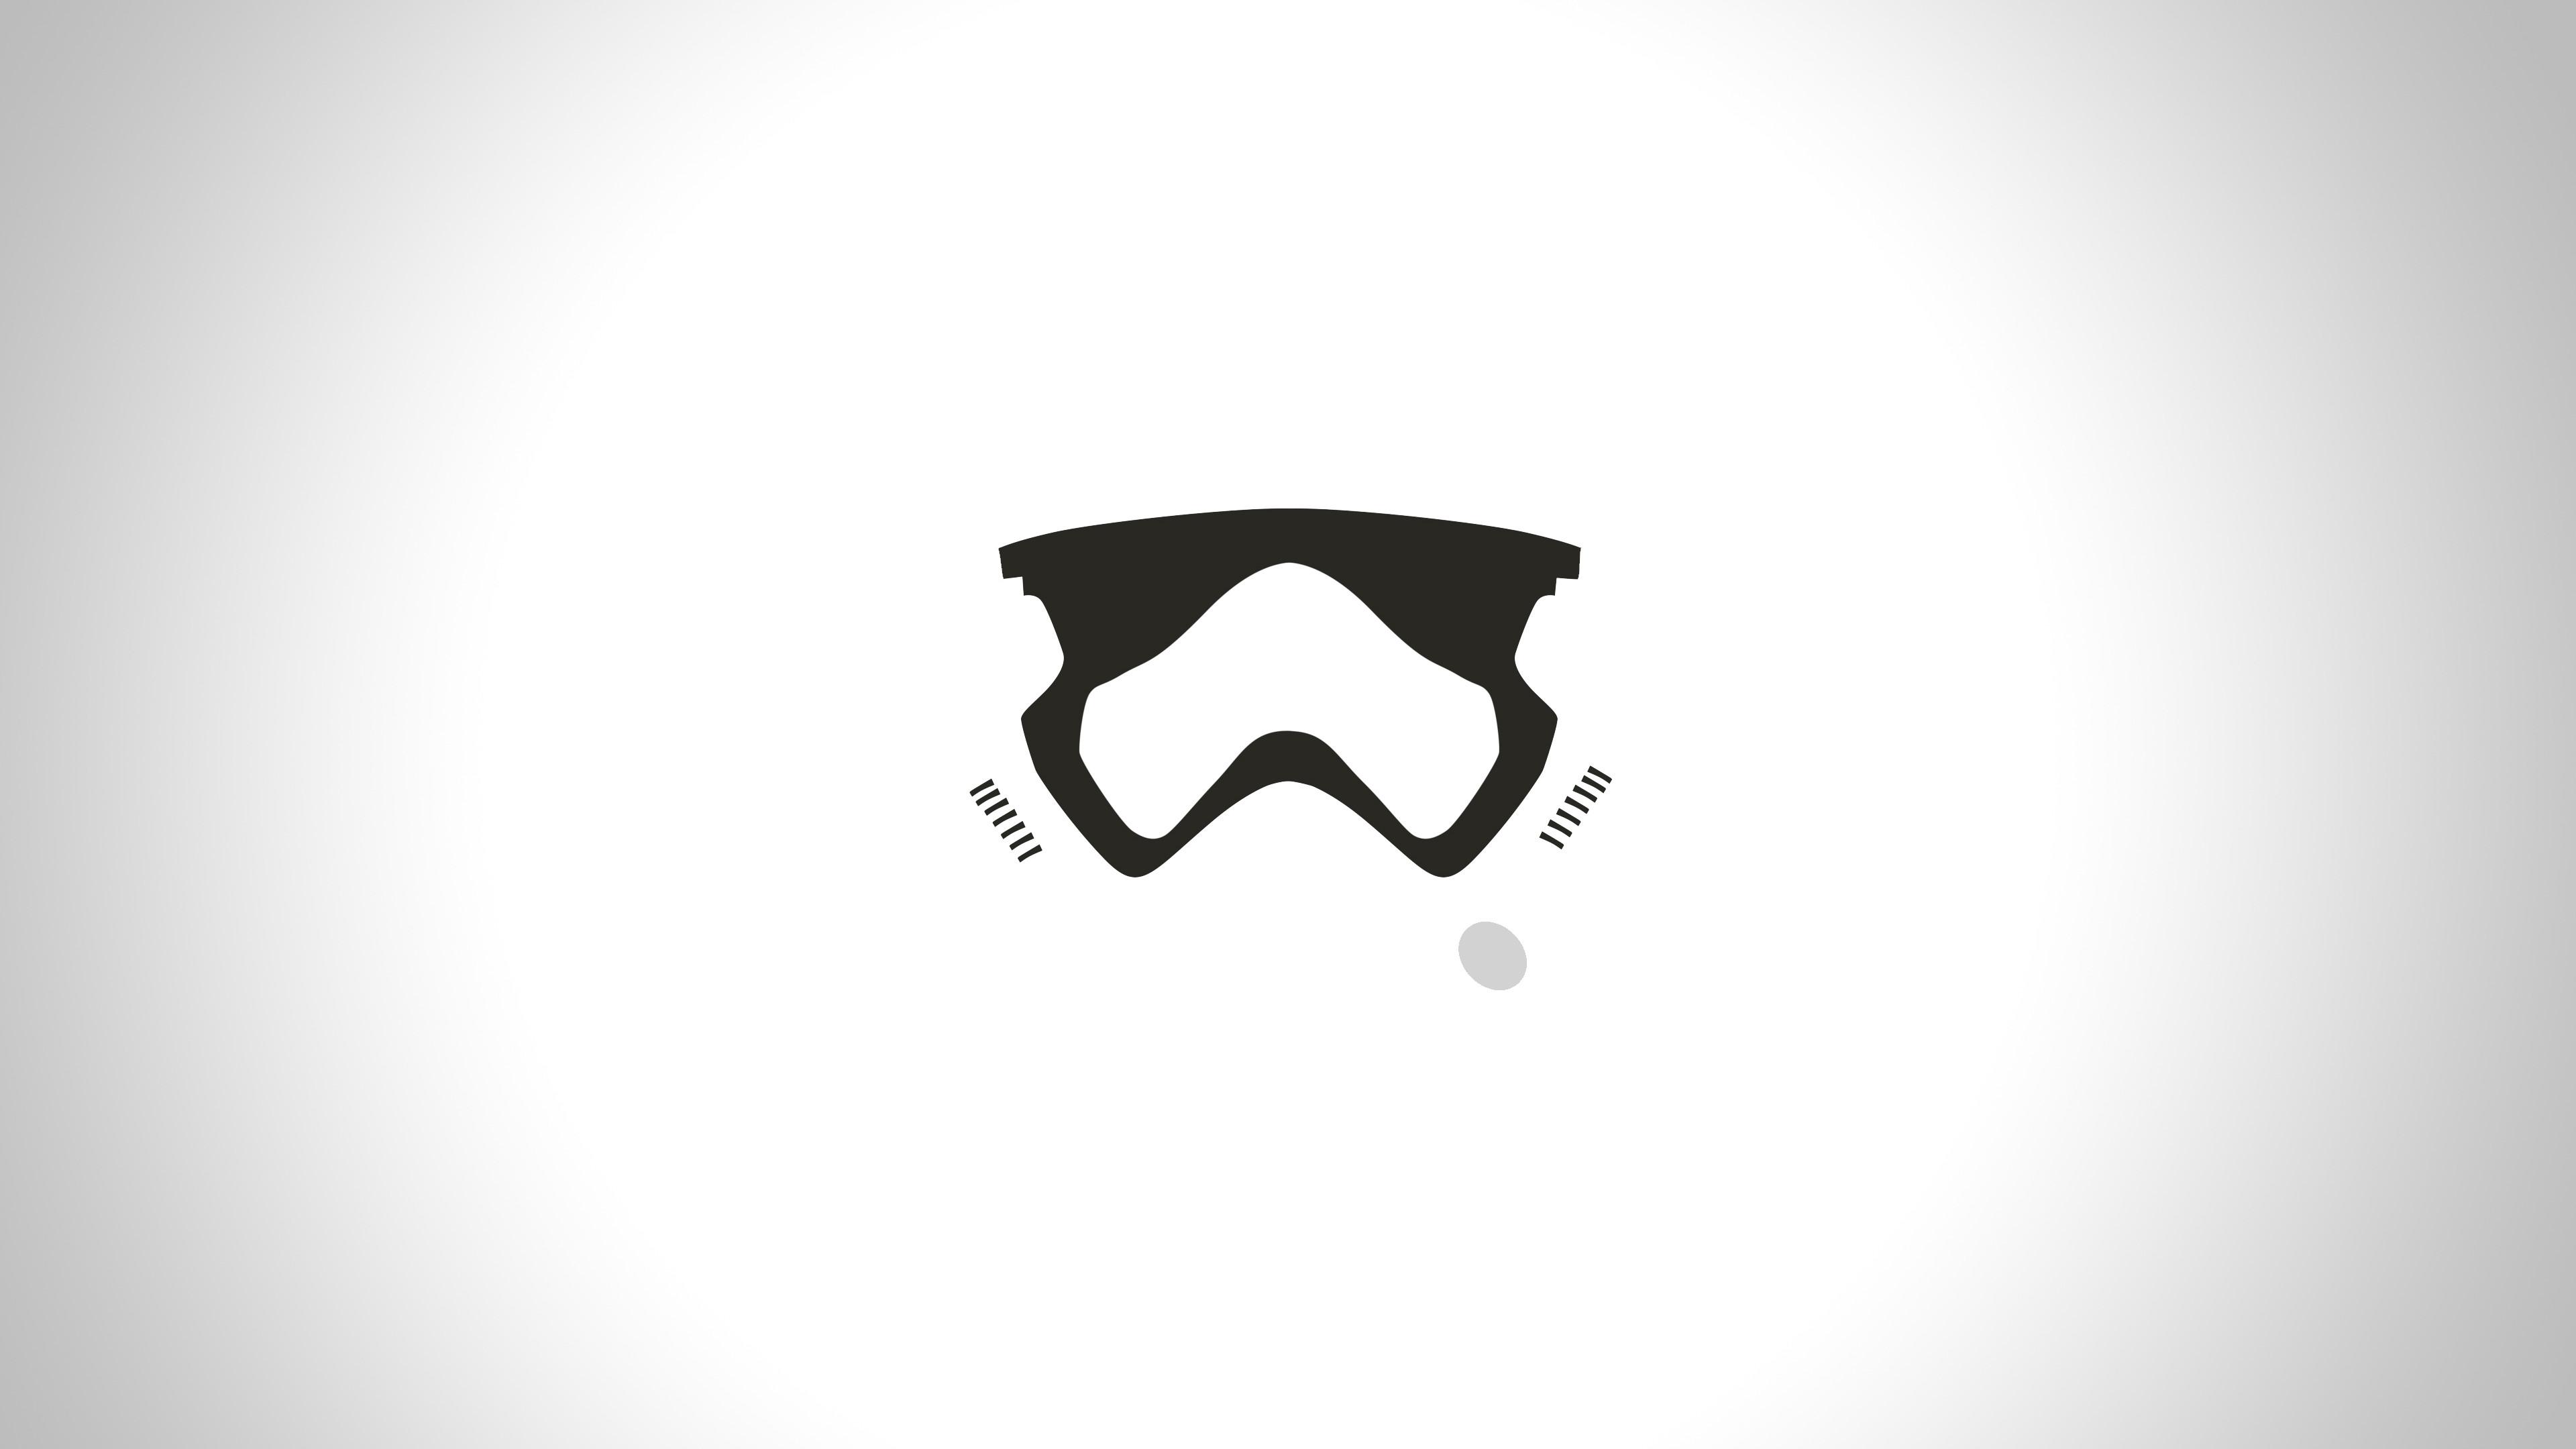 Res: 3840x2160, First order stormtrooper wallpaper imgur